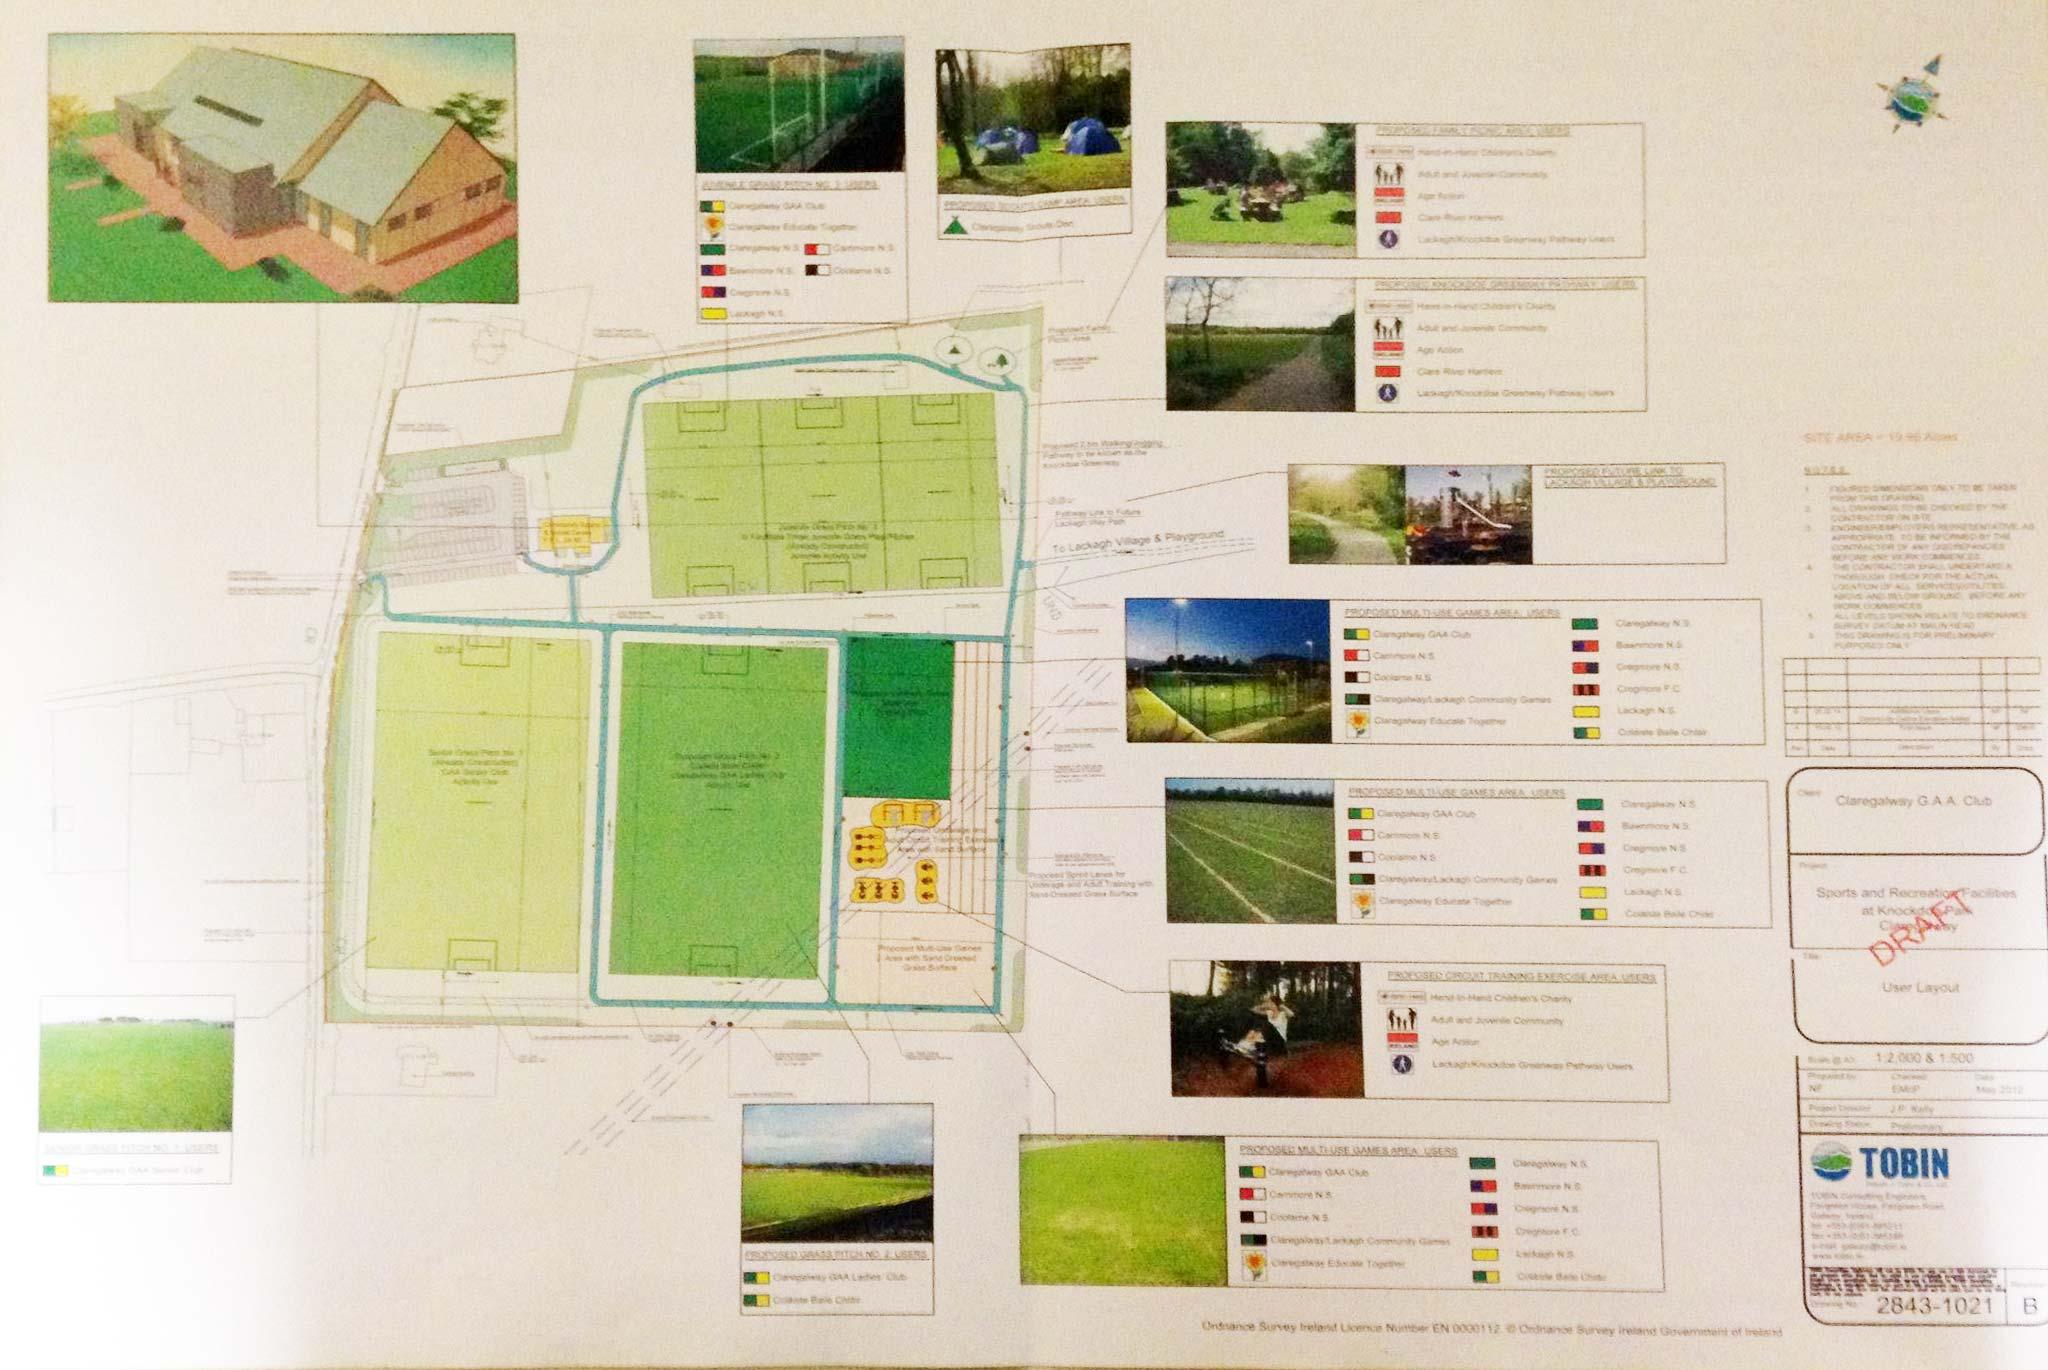 knockdoe-park-plans